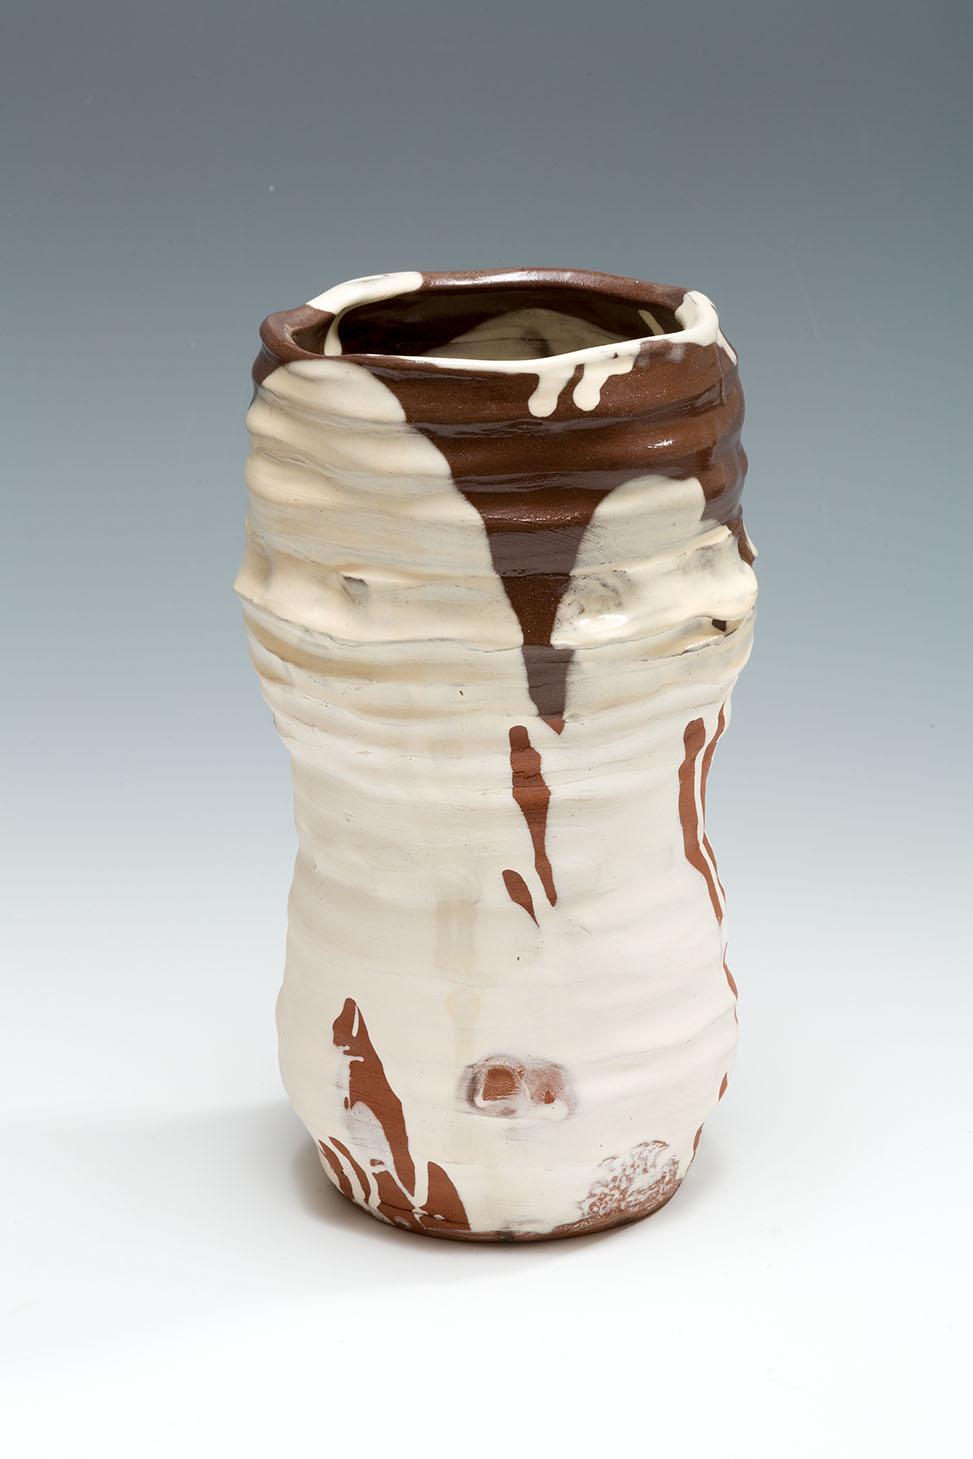 Slipware Pot, terracotta, slip and honey glaze